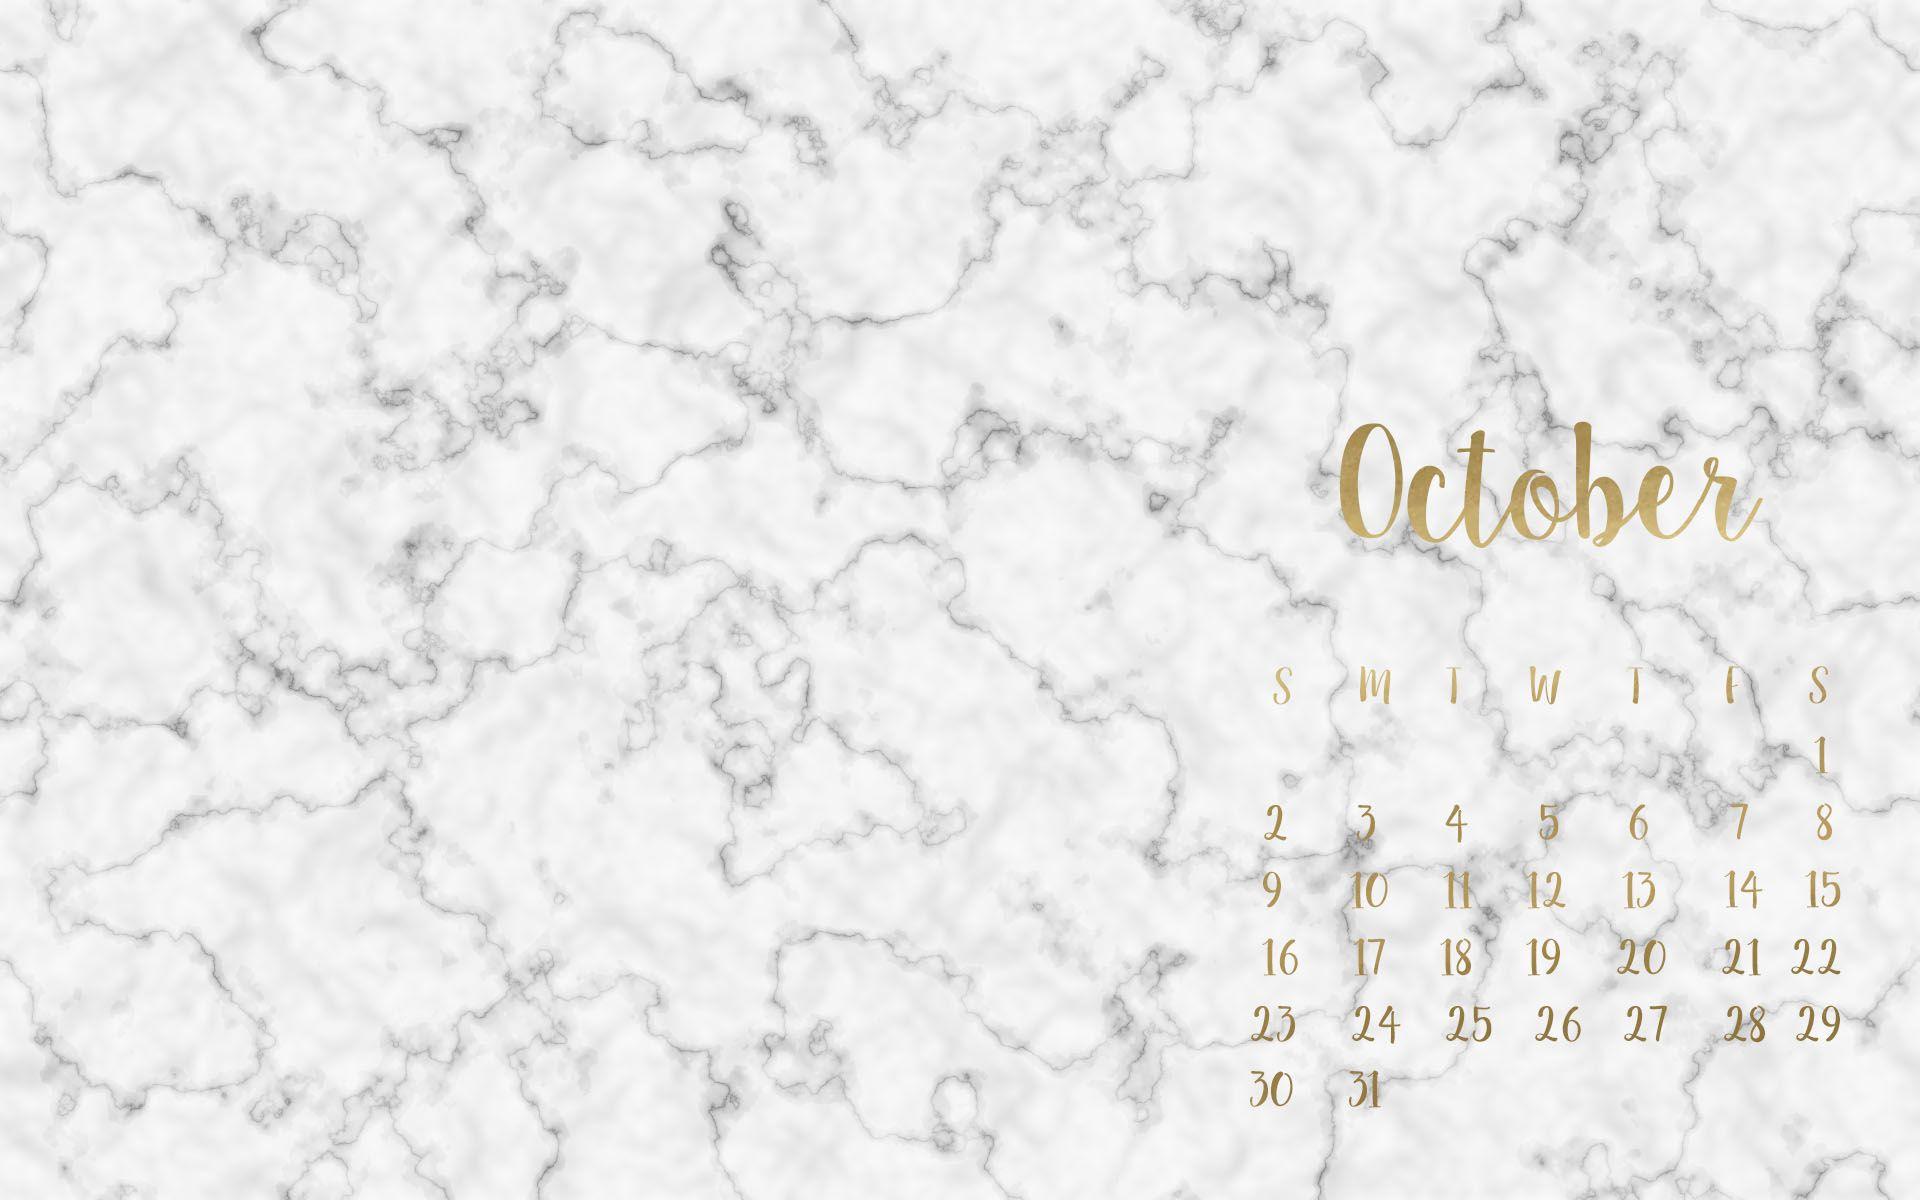 Download Wallpaper Marble Chic - bf3cf23016acc681e6b37b3dffbae602  Snapshot_707989.jpg